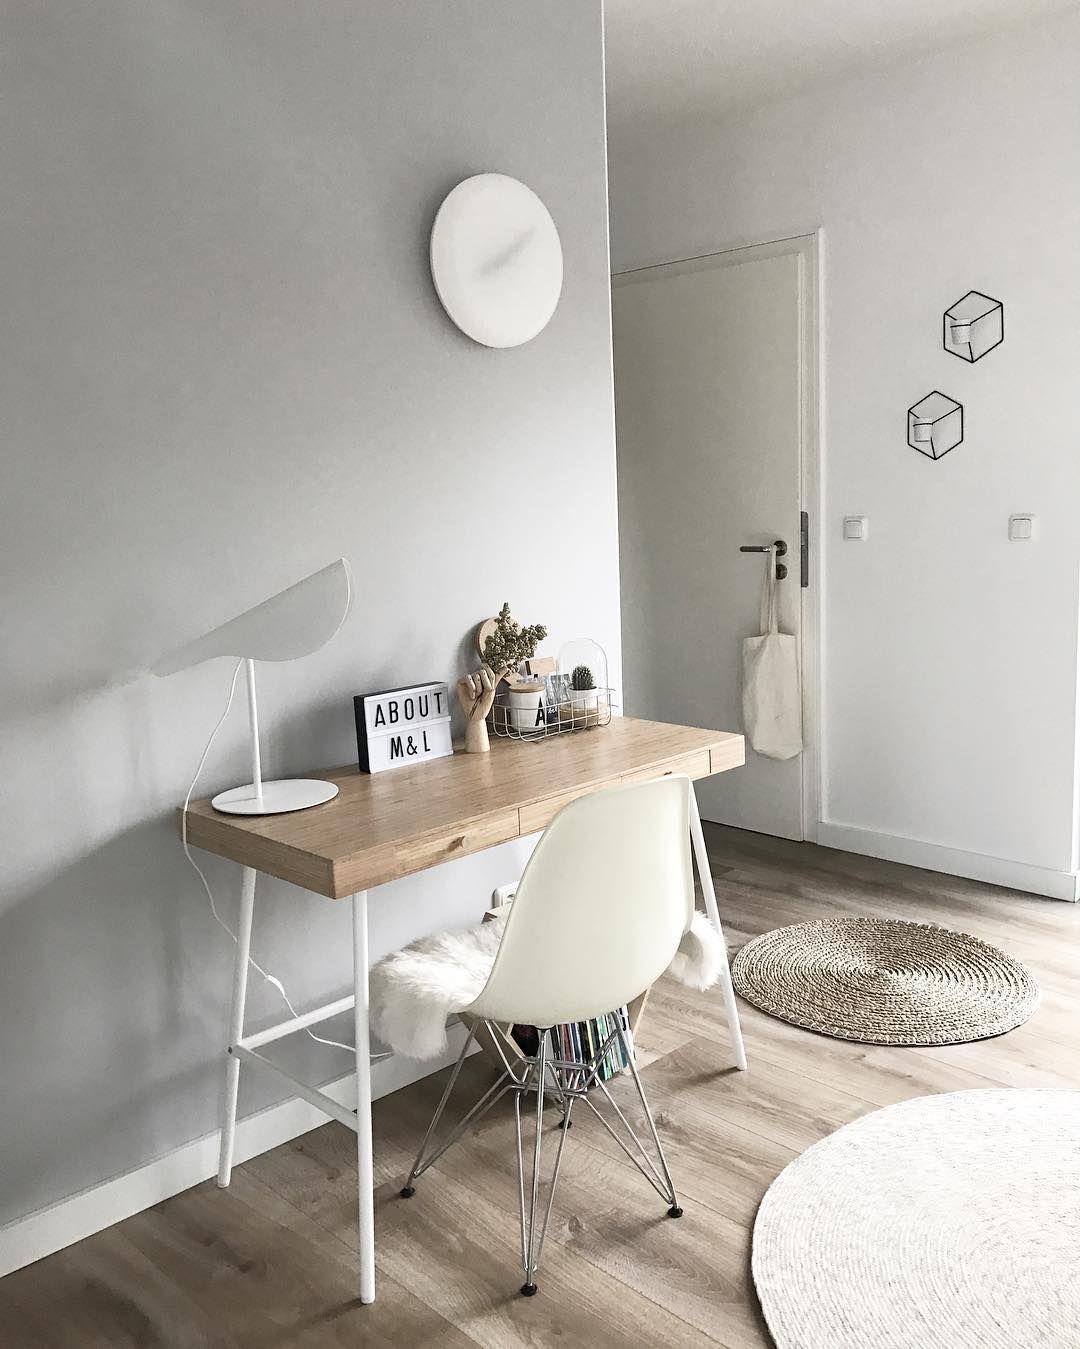 Desk In Bedroom Ideas. Ikea  Lill sen desk lenijo BedroomBedroom IdeasBedroom homedecor Pinterest Desks